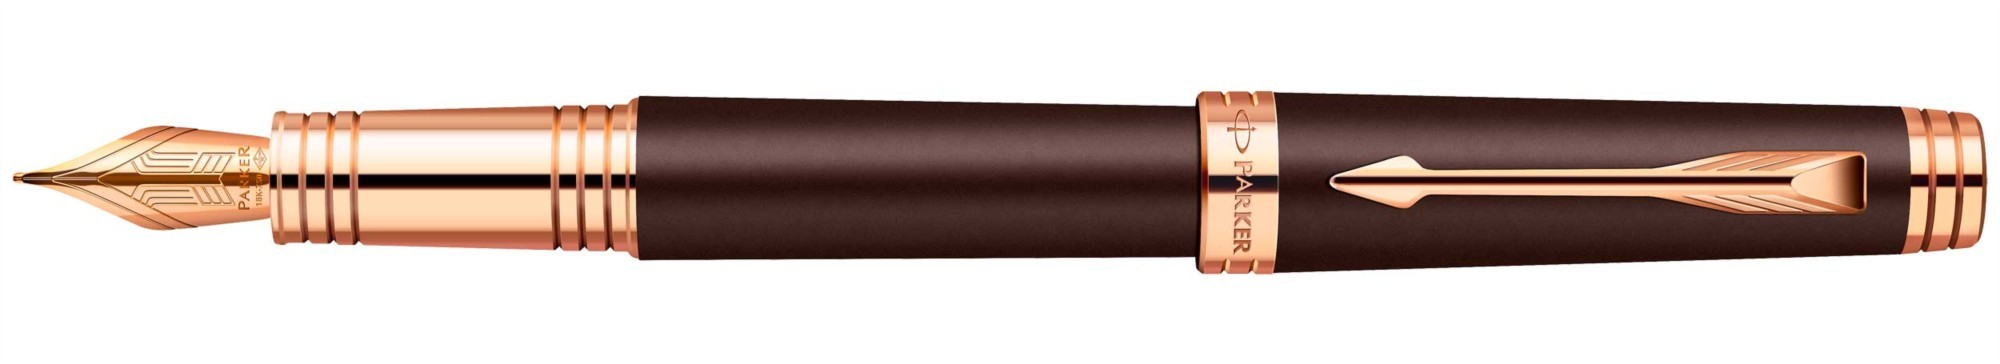 Перьевая ручка Parker Premier Soft F560 Brown PGT